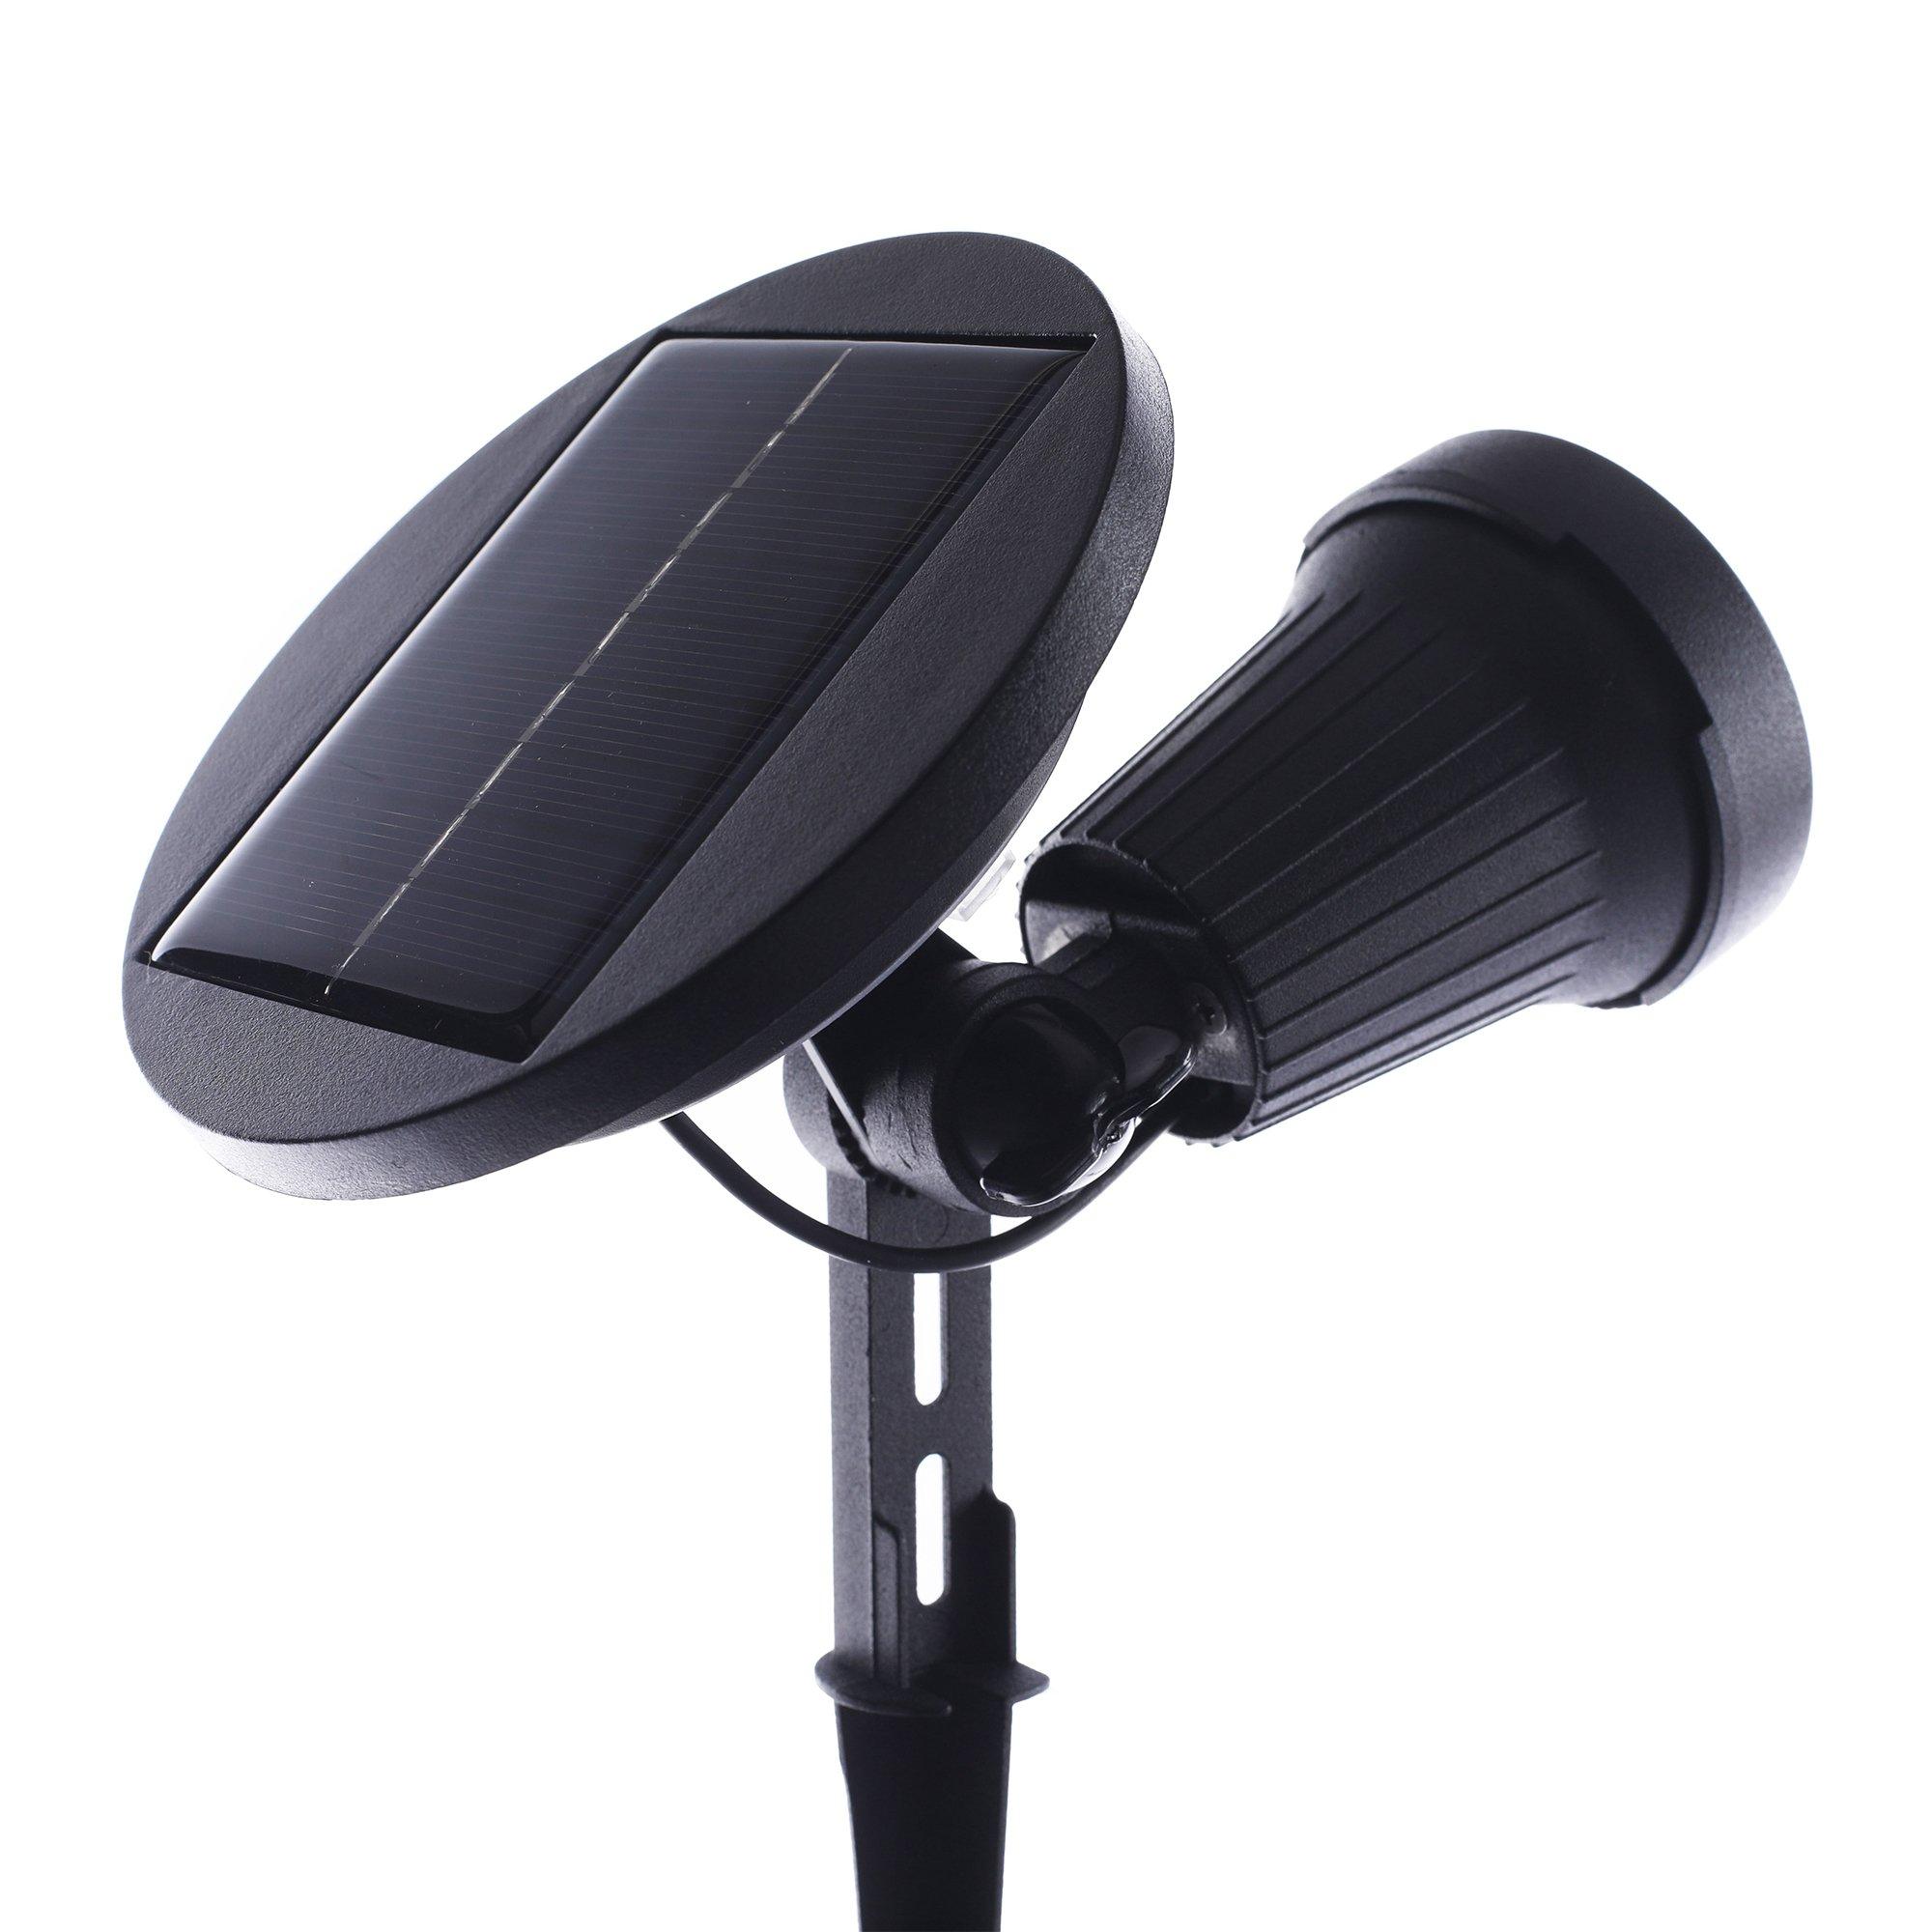 Davinci Solar Spotlight - Premium Aluminum Outdoor Spot Light for Landscape Wall, or Garden Lighting - Bright Warm White LED, Solar Powered Lights, Wireless Spotlights